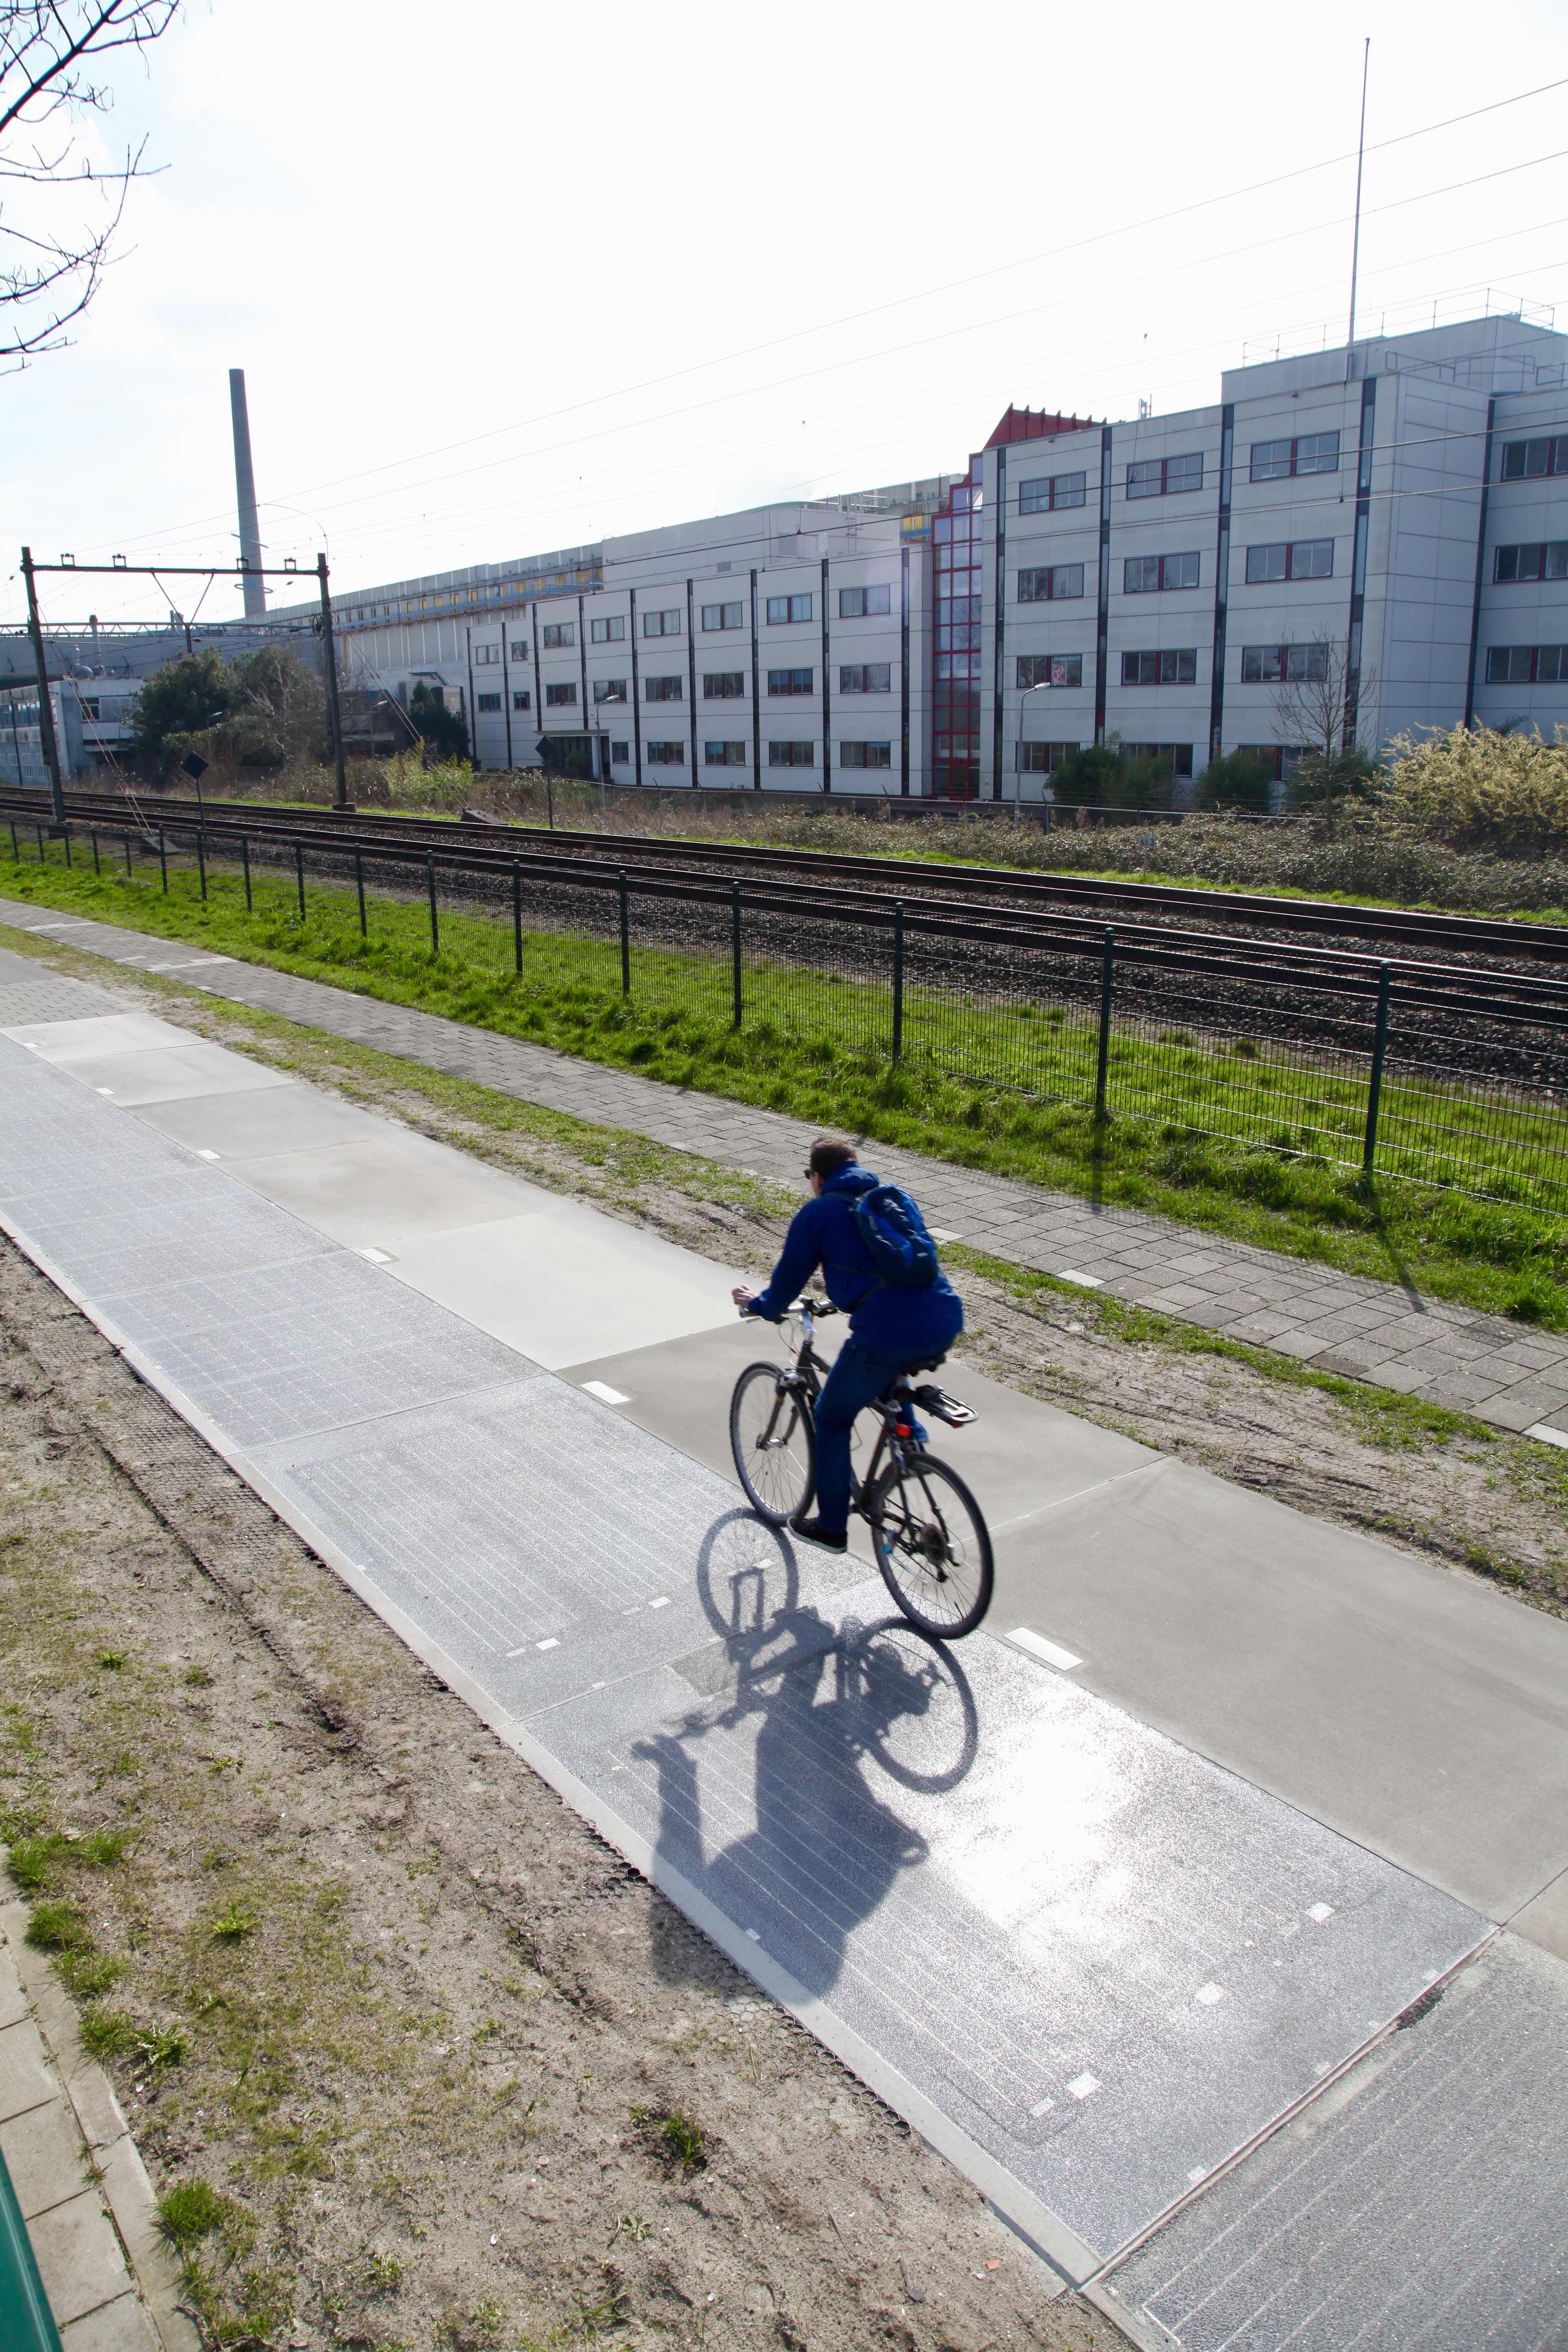 http://openbareverlichting.nl/wp-content/uploads/2018/06/SolaRoad.jpg